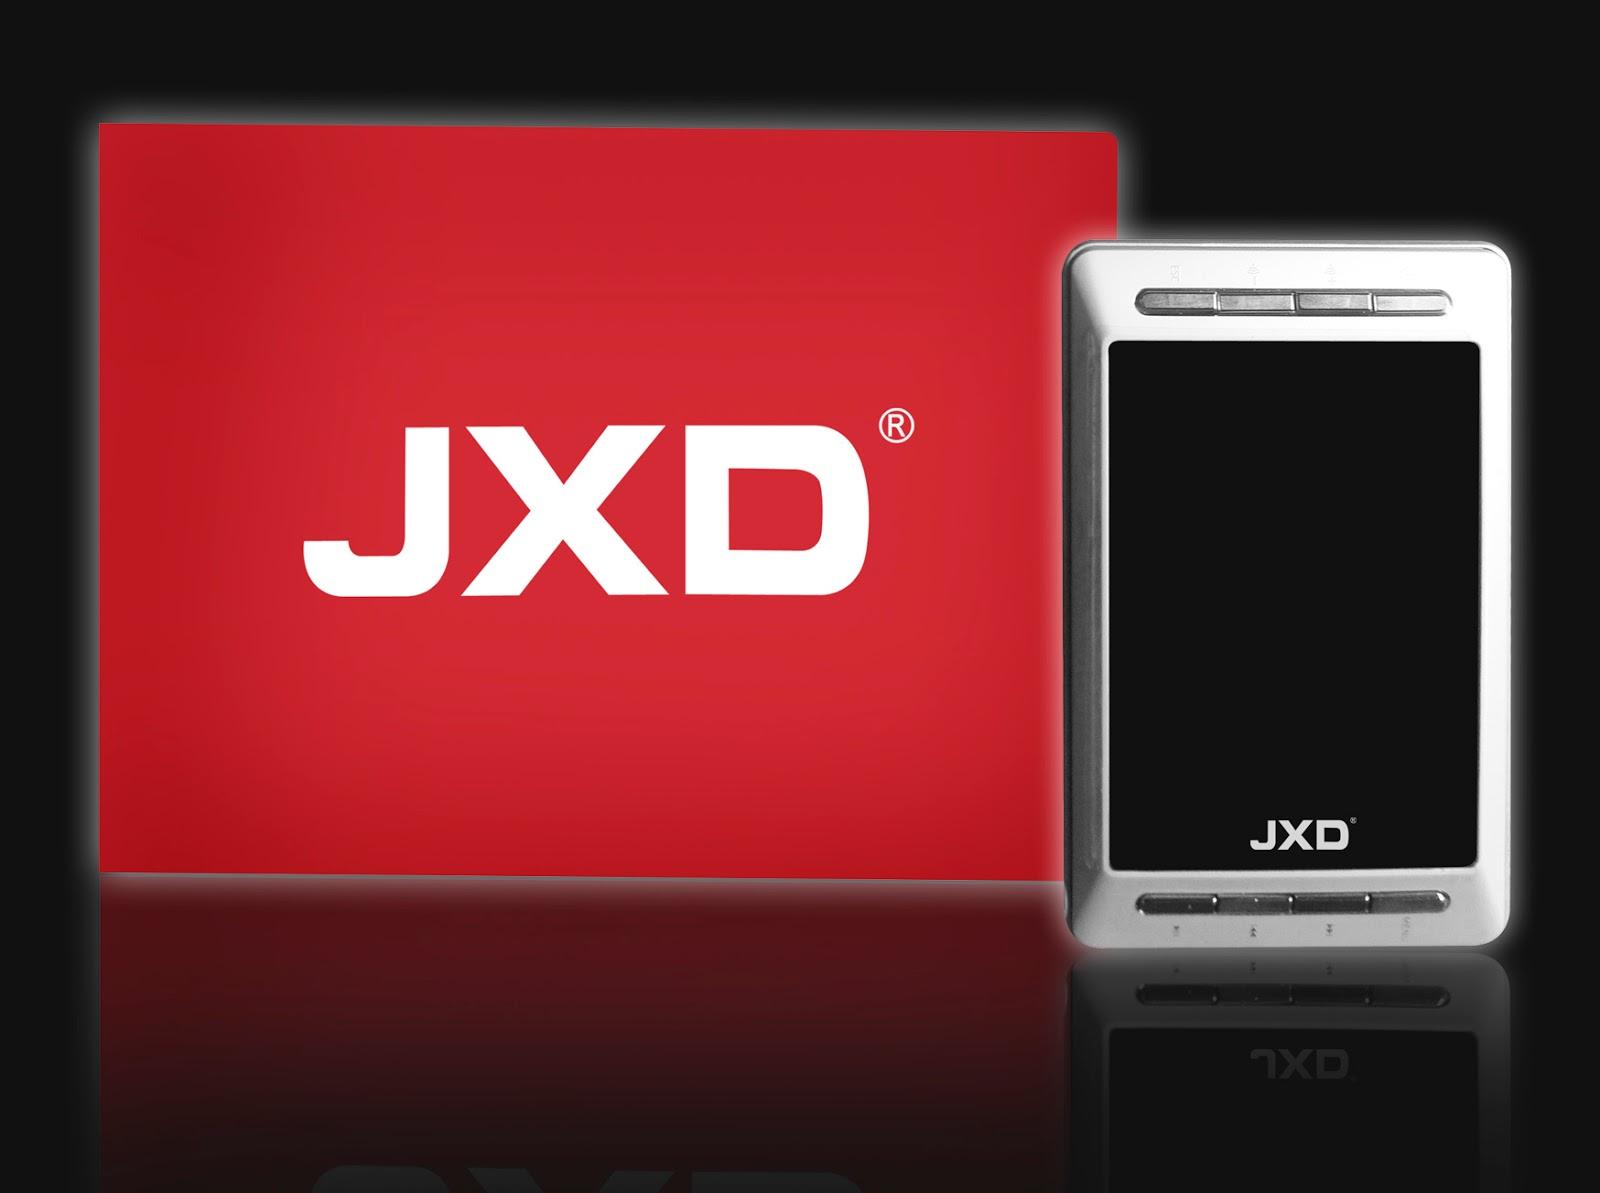 Jxd ipod games model 696